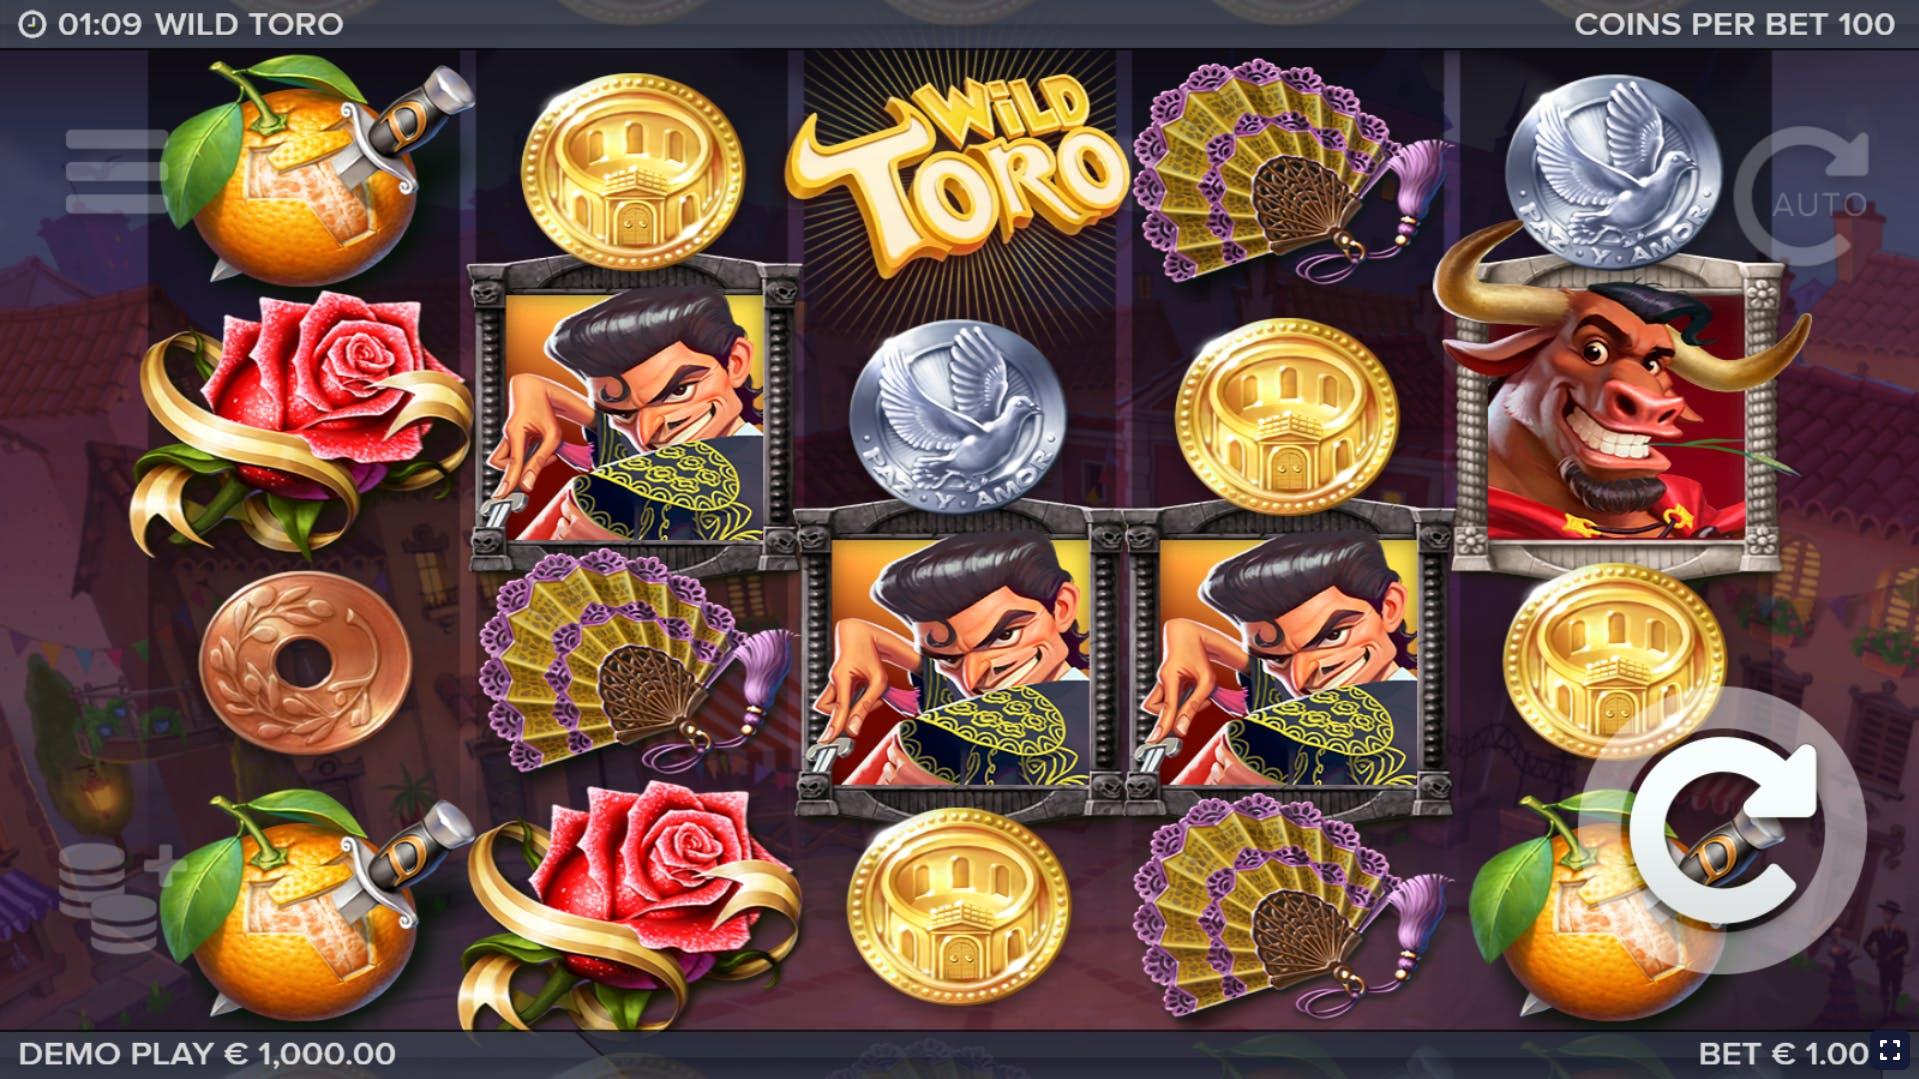 wild toro slot publicité elk studio